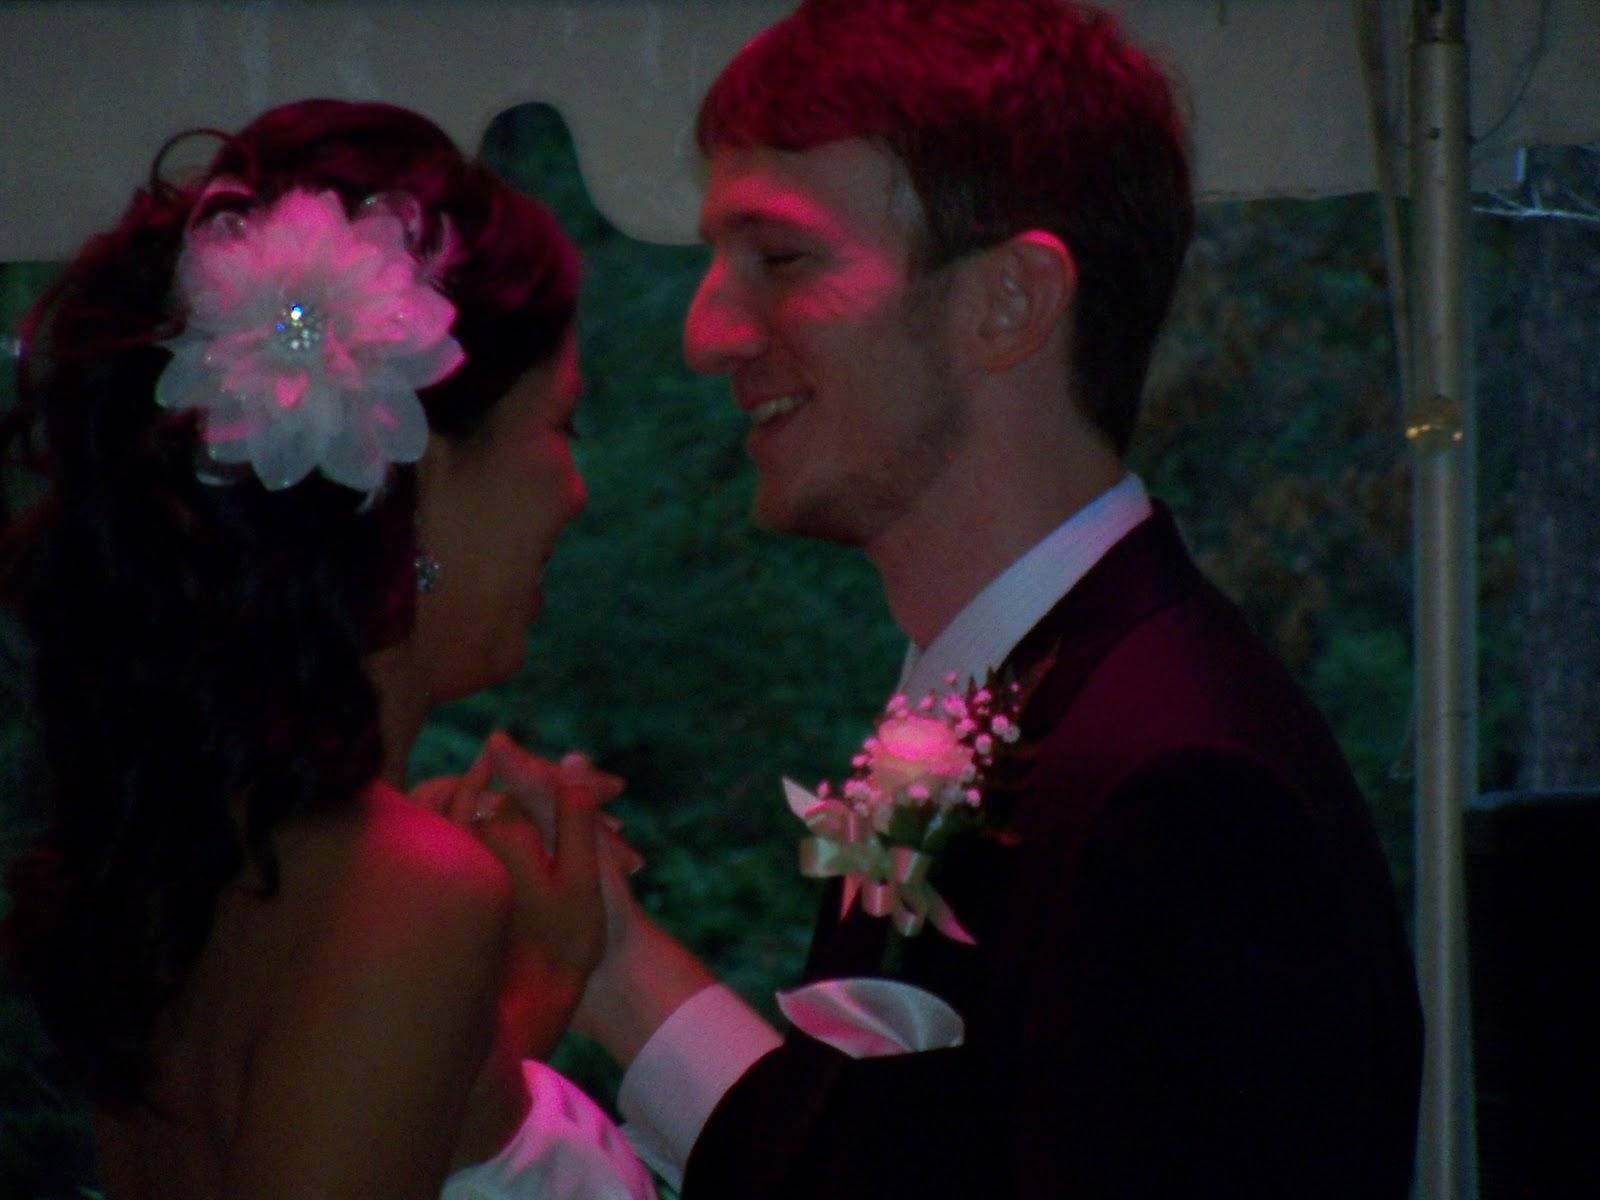 Ben and Jessica Coons wedding - 115_0838.JPG